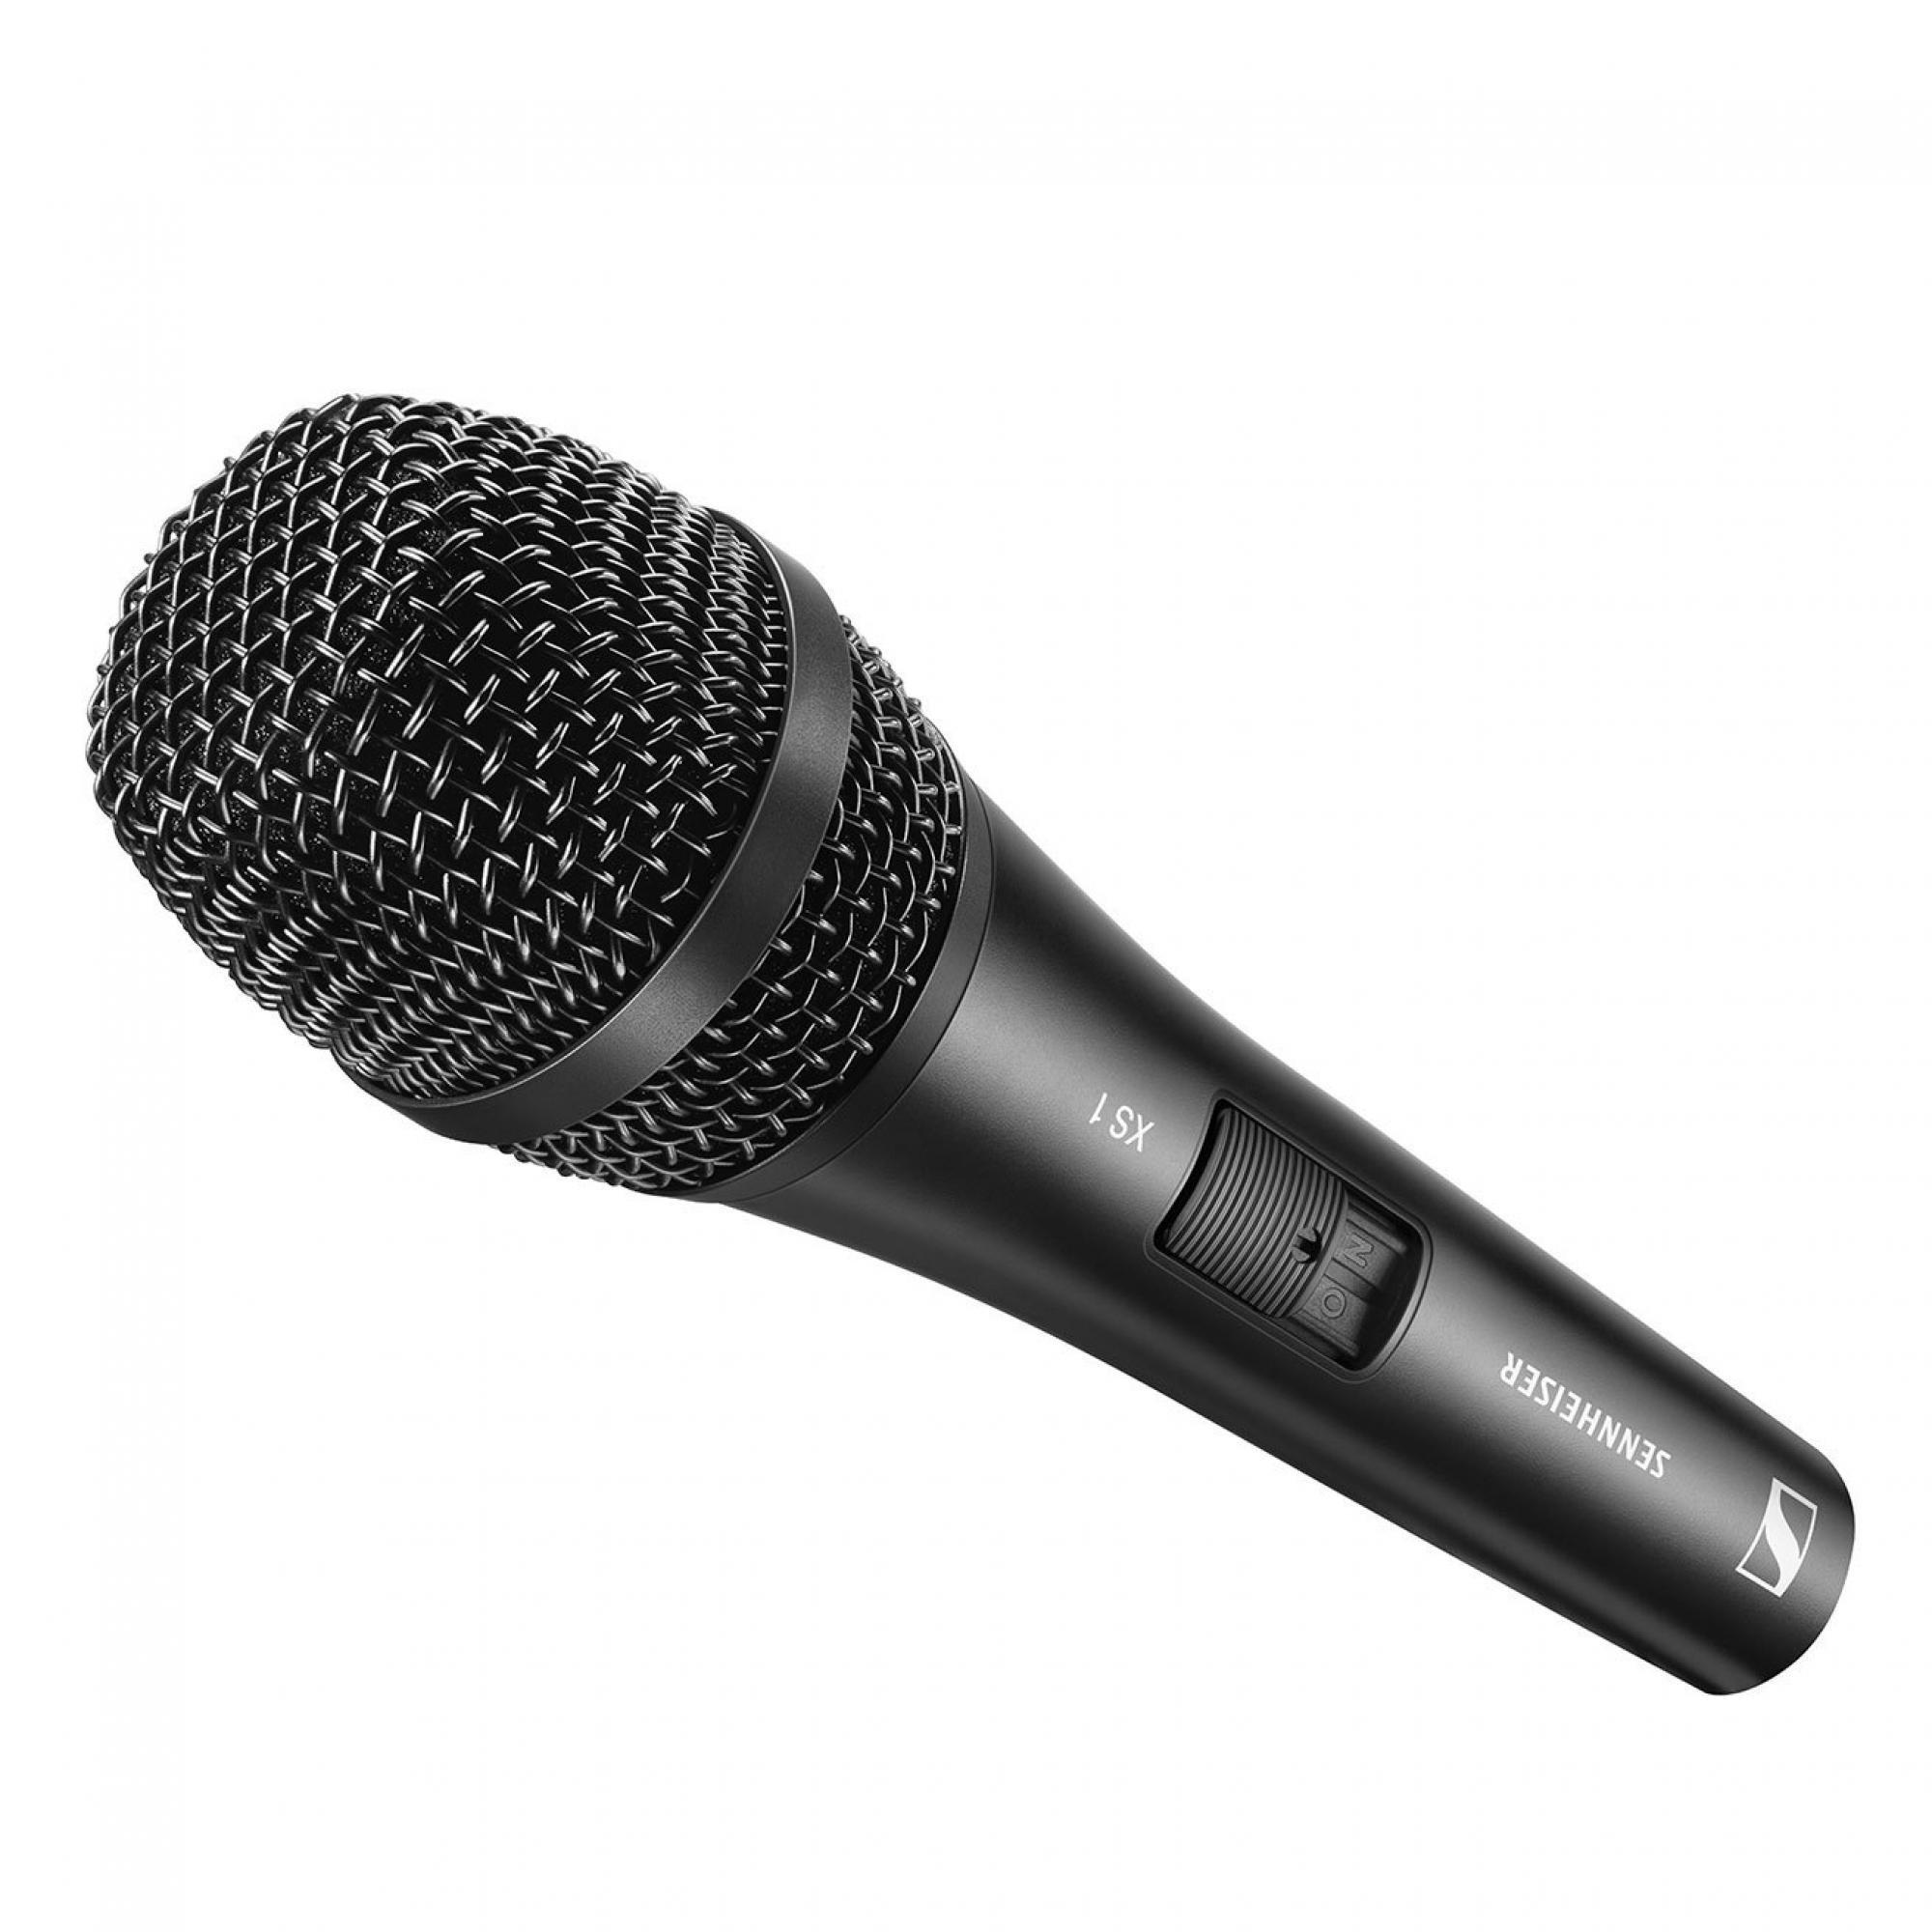 Microfone com fio Sennheiser XS1 Cardioide